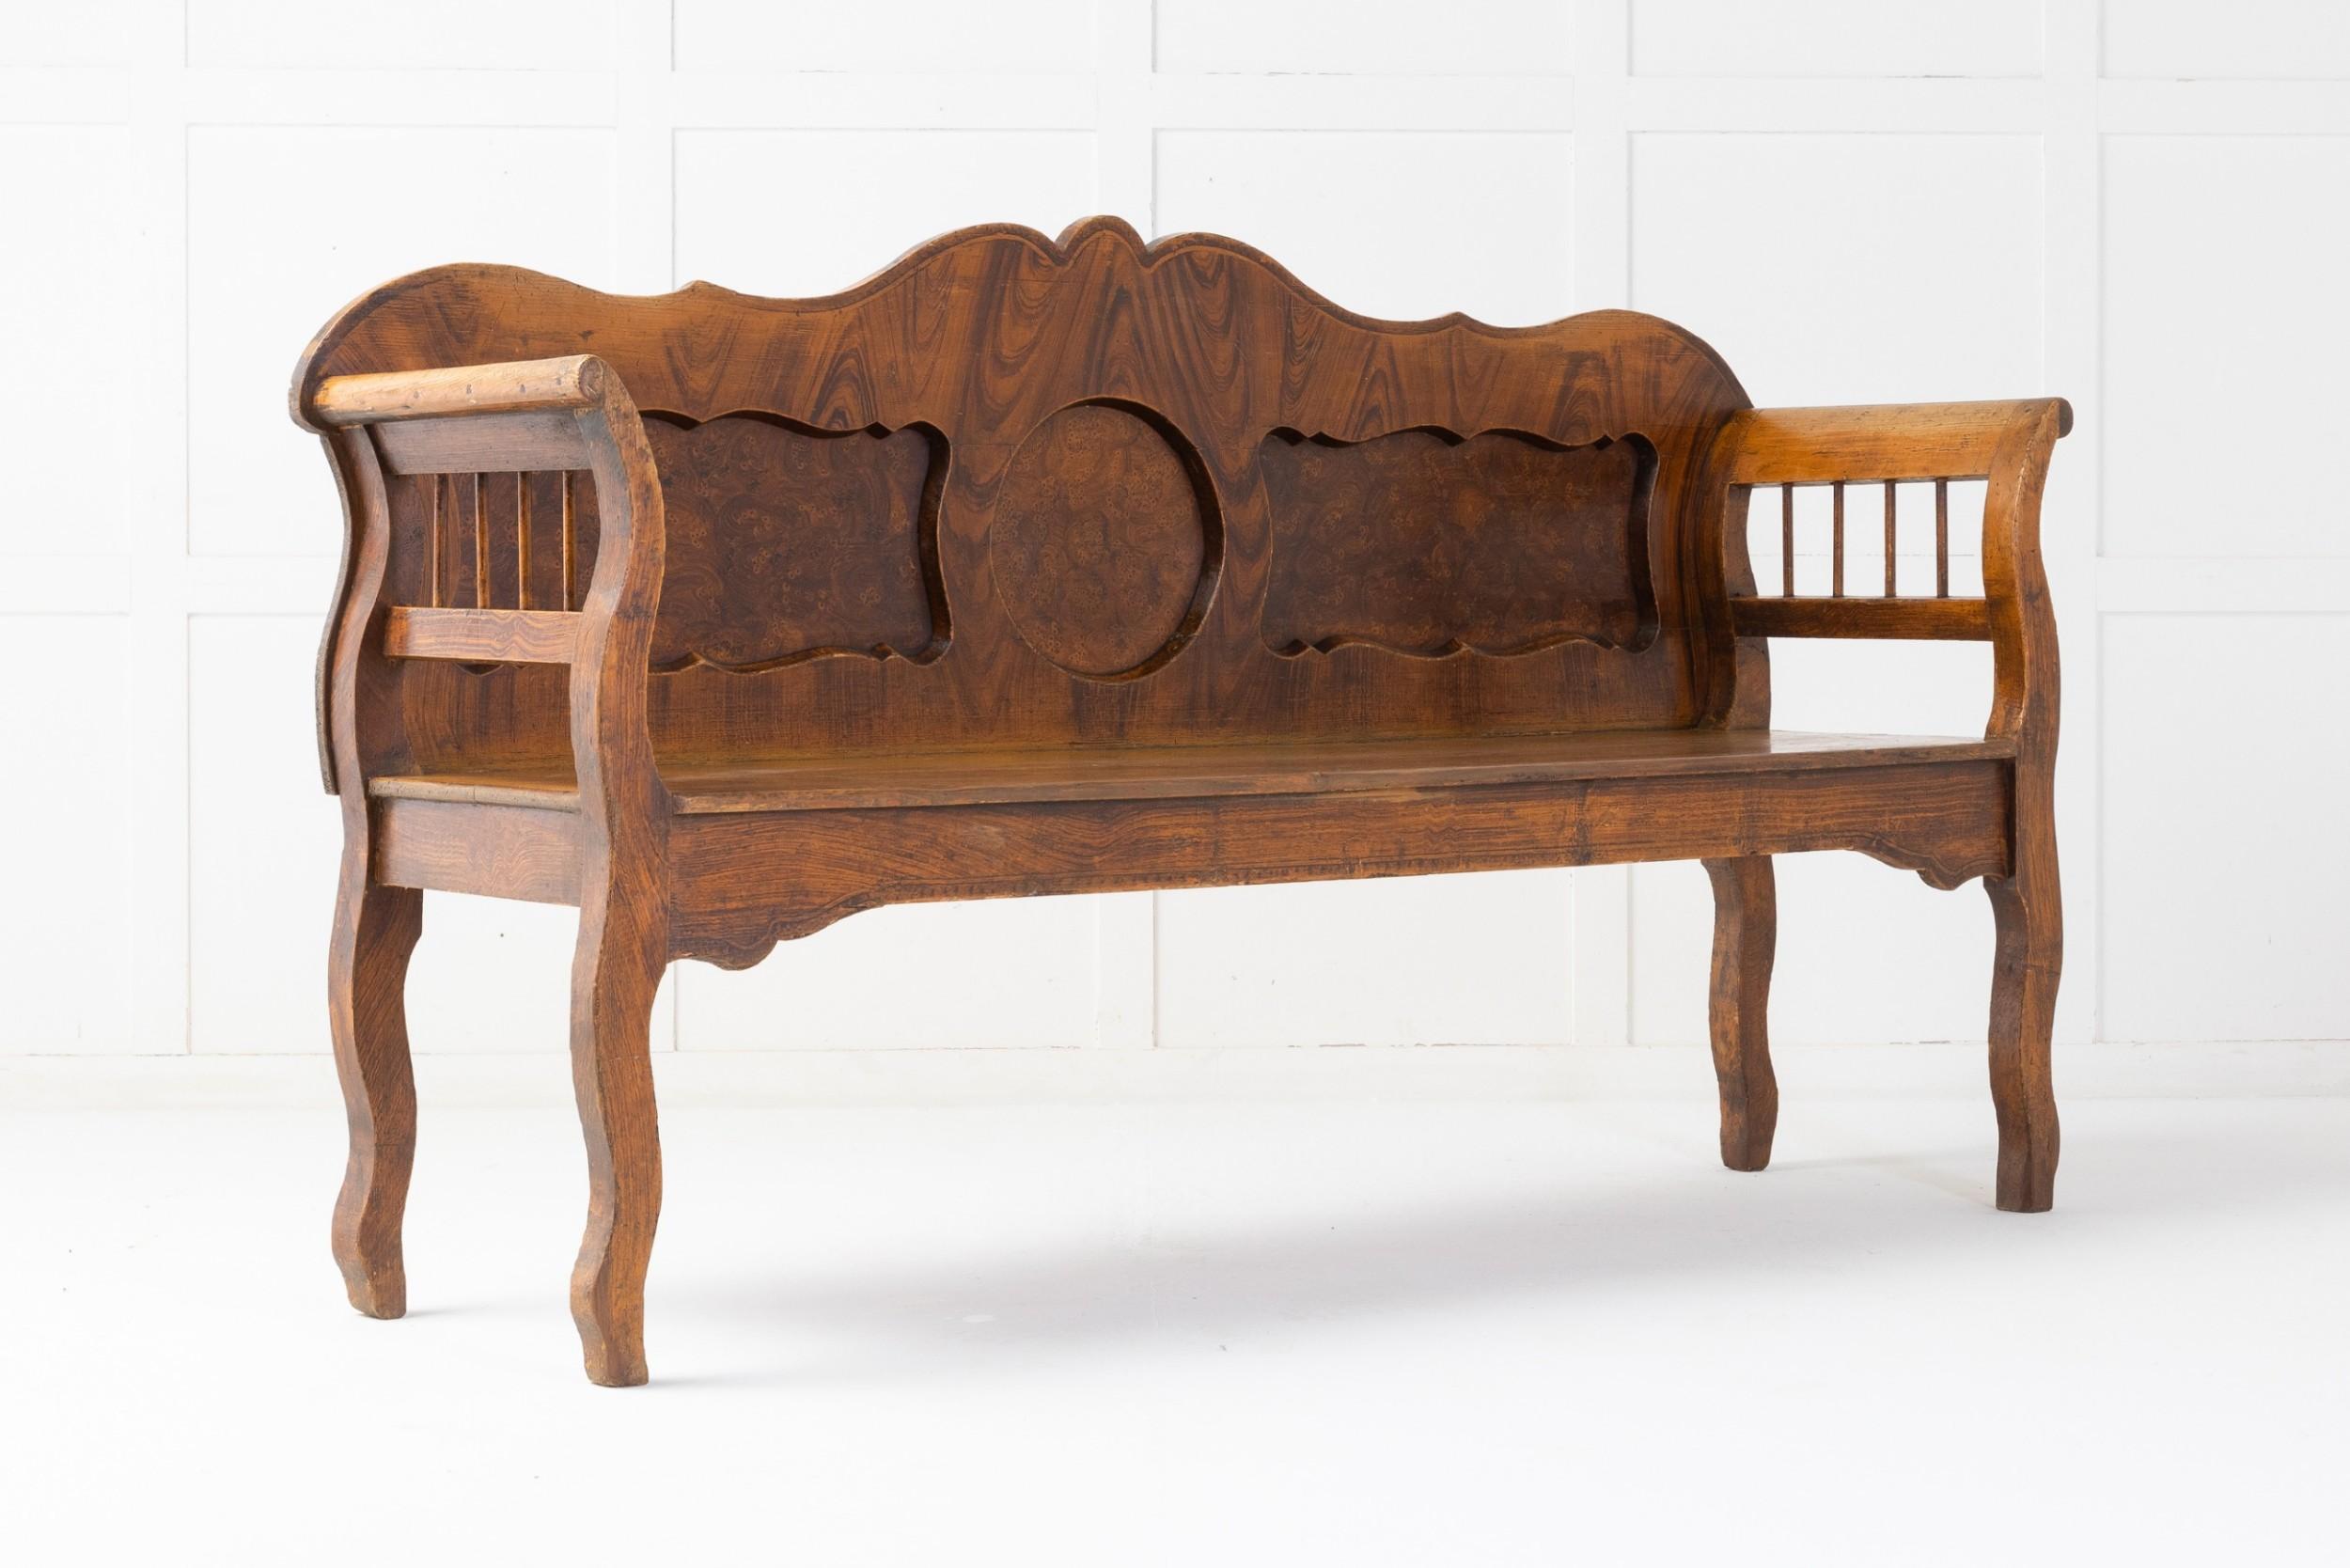 19th century scandinavian painted bench